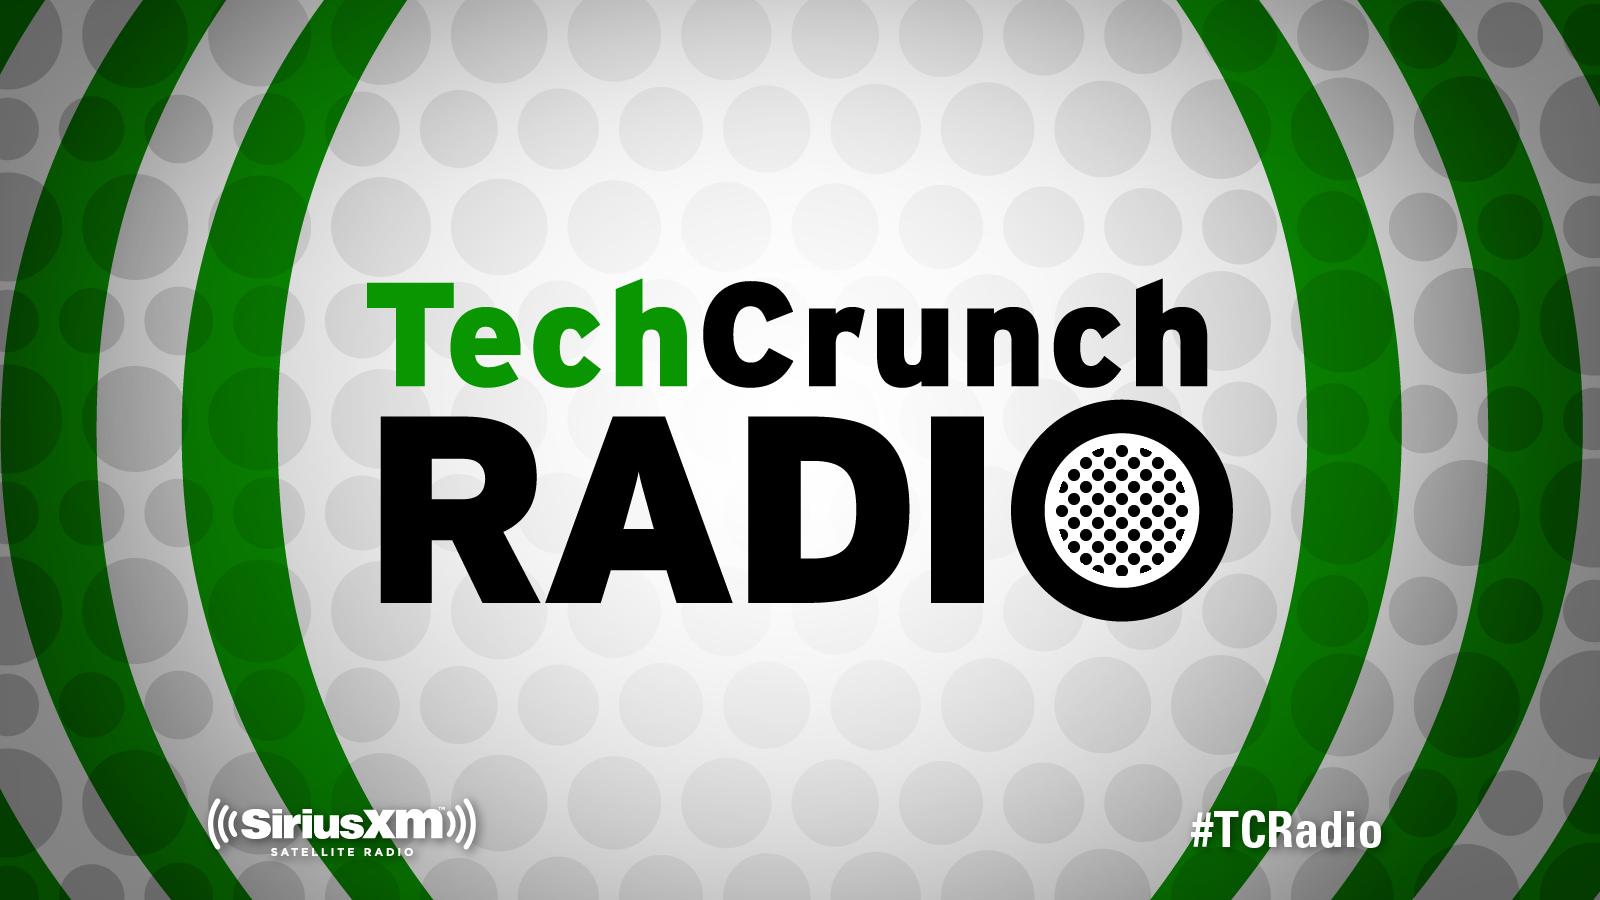 techcrunch-radio1